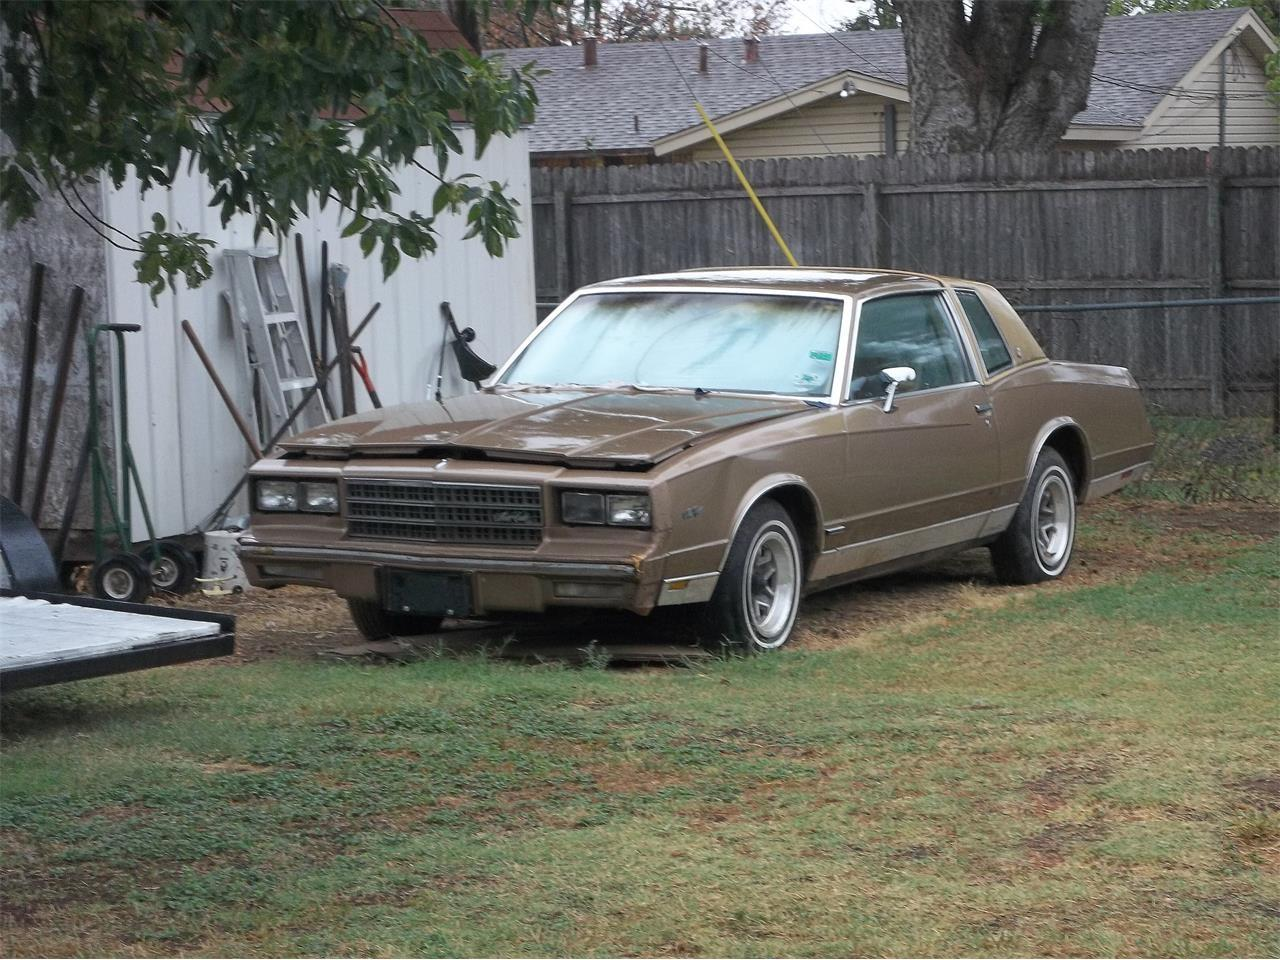 1982 Chevrolet Monte Carlo For Sale Classiccars Com Cc 1137098